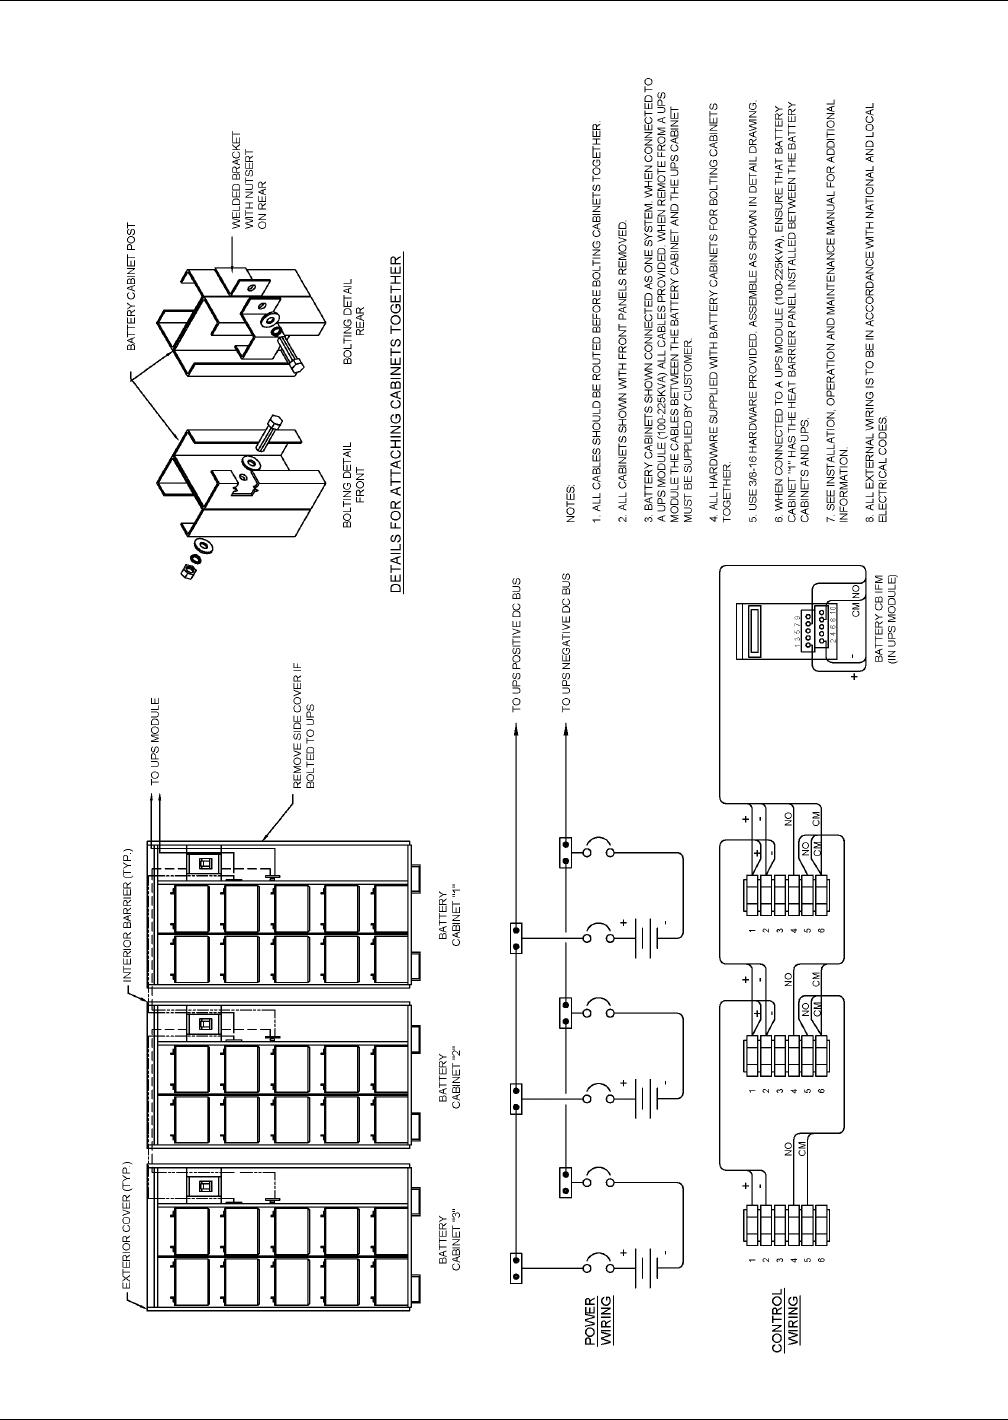 Emerson Liebert Series 610 Ups Users Manual Rack Mounted Wiring Diagram Installation Drawings